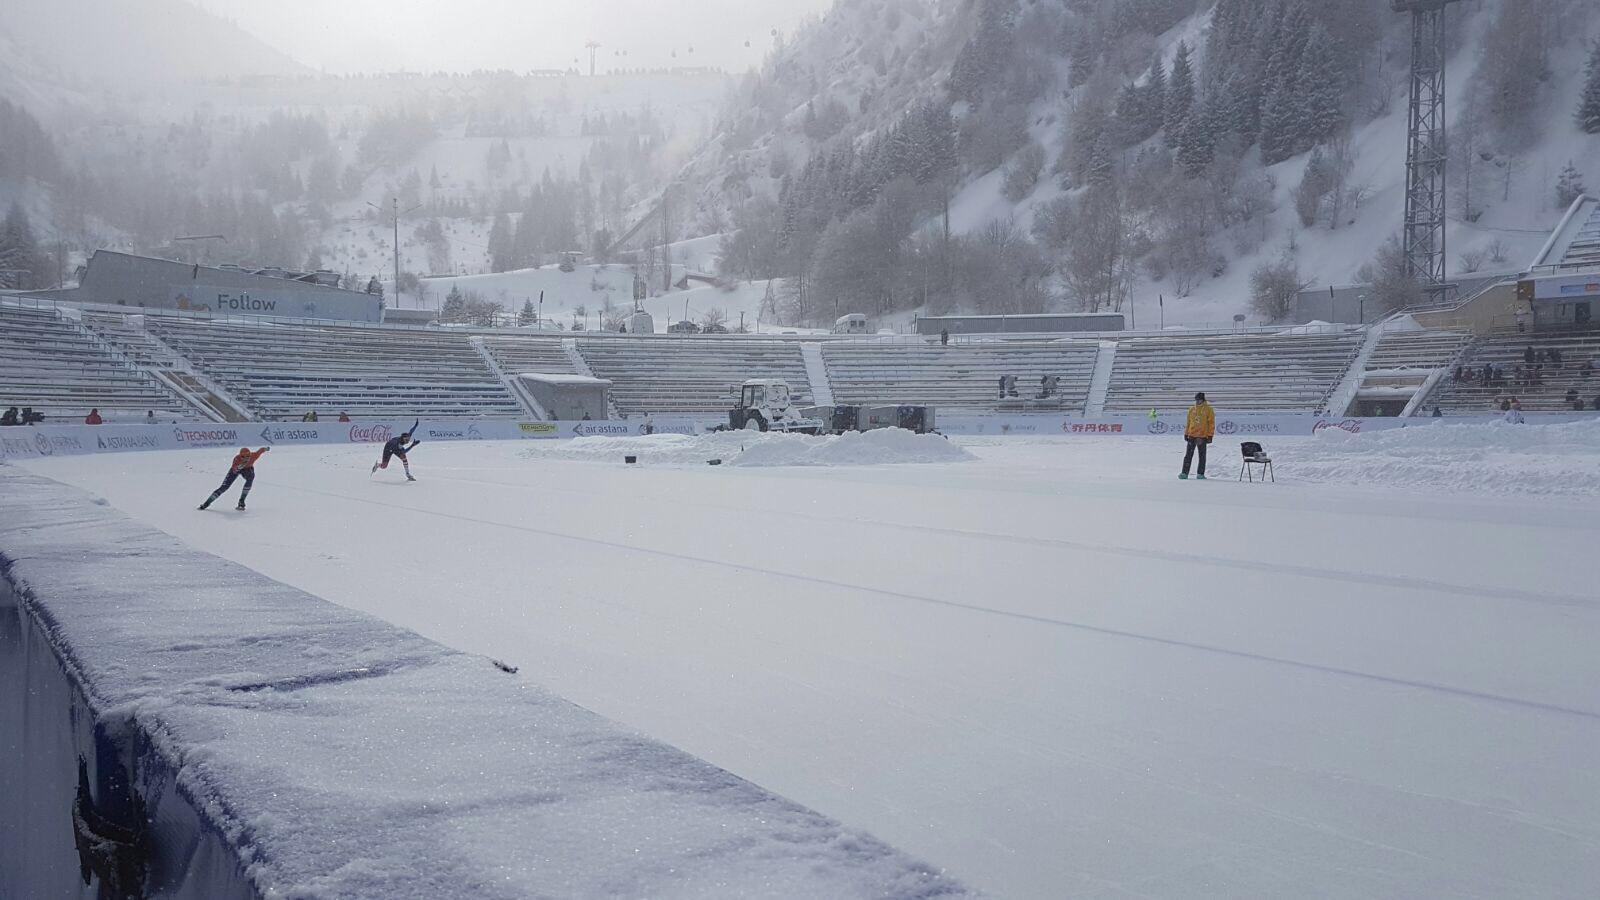 Ariane Smit, Almaty, schaatsen, Universiade